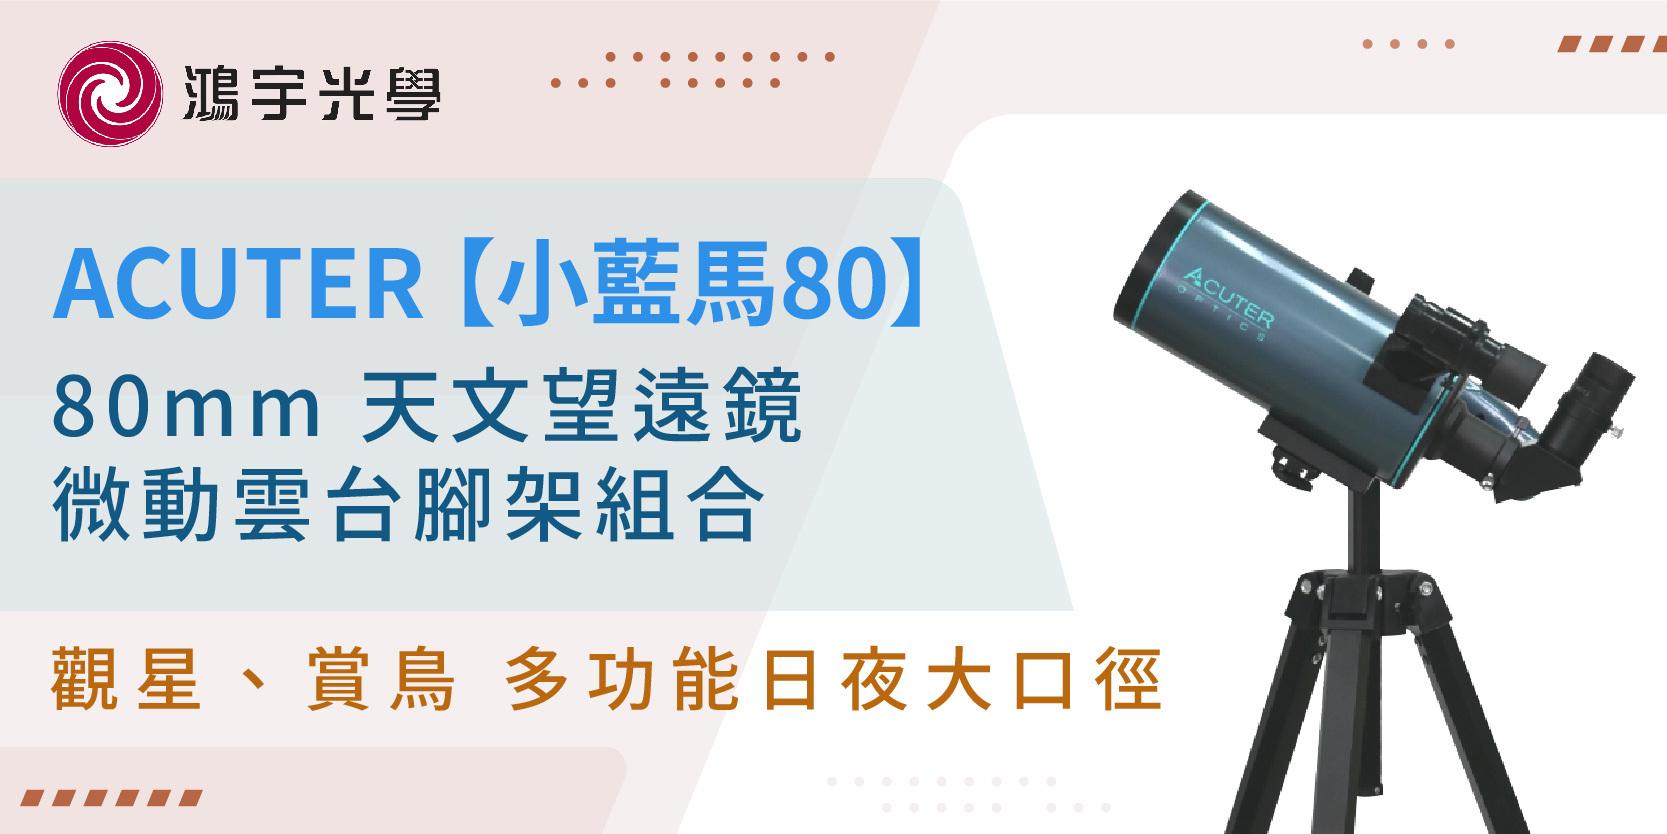 ACUTER 【小藍馬80】80mm 天文望遠鏡 微動雲台腳架組合